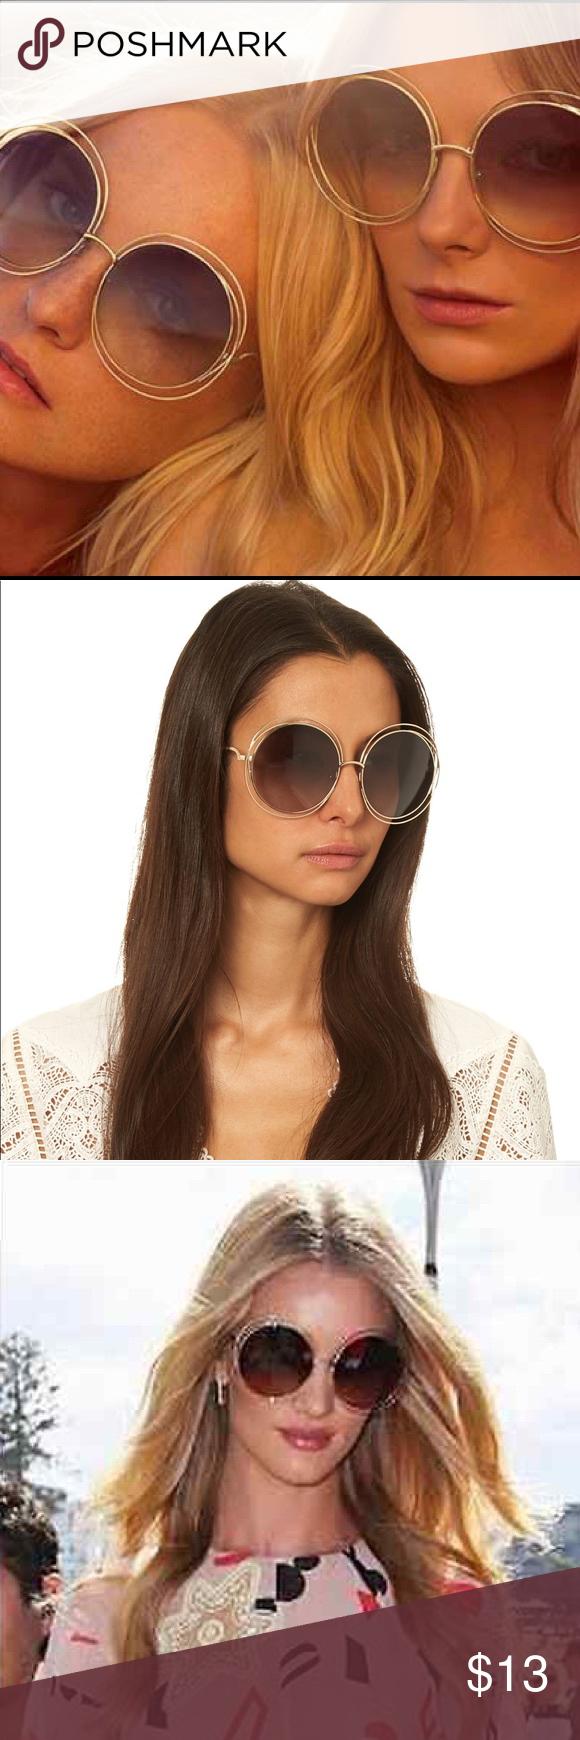 3891203c68ea Chloe INSPIRED Round Sunglasses REPLICA of the Chloe Carlina oversized Round  Sunglasses! BRAND NWT!